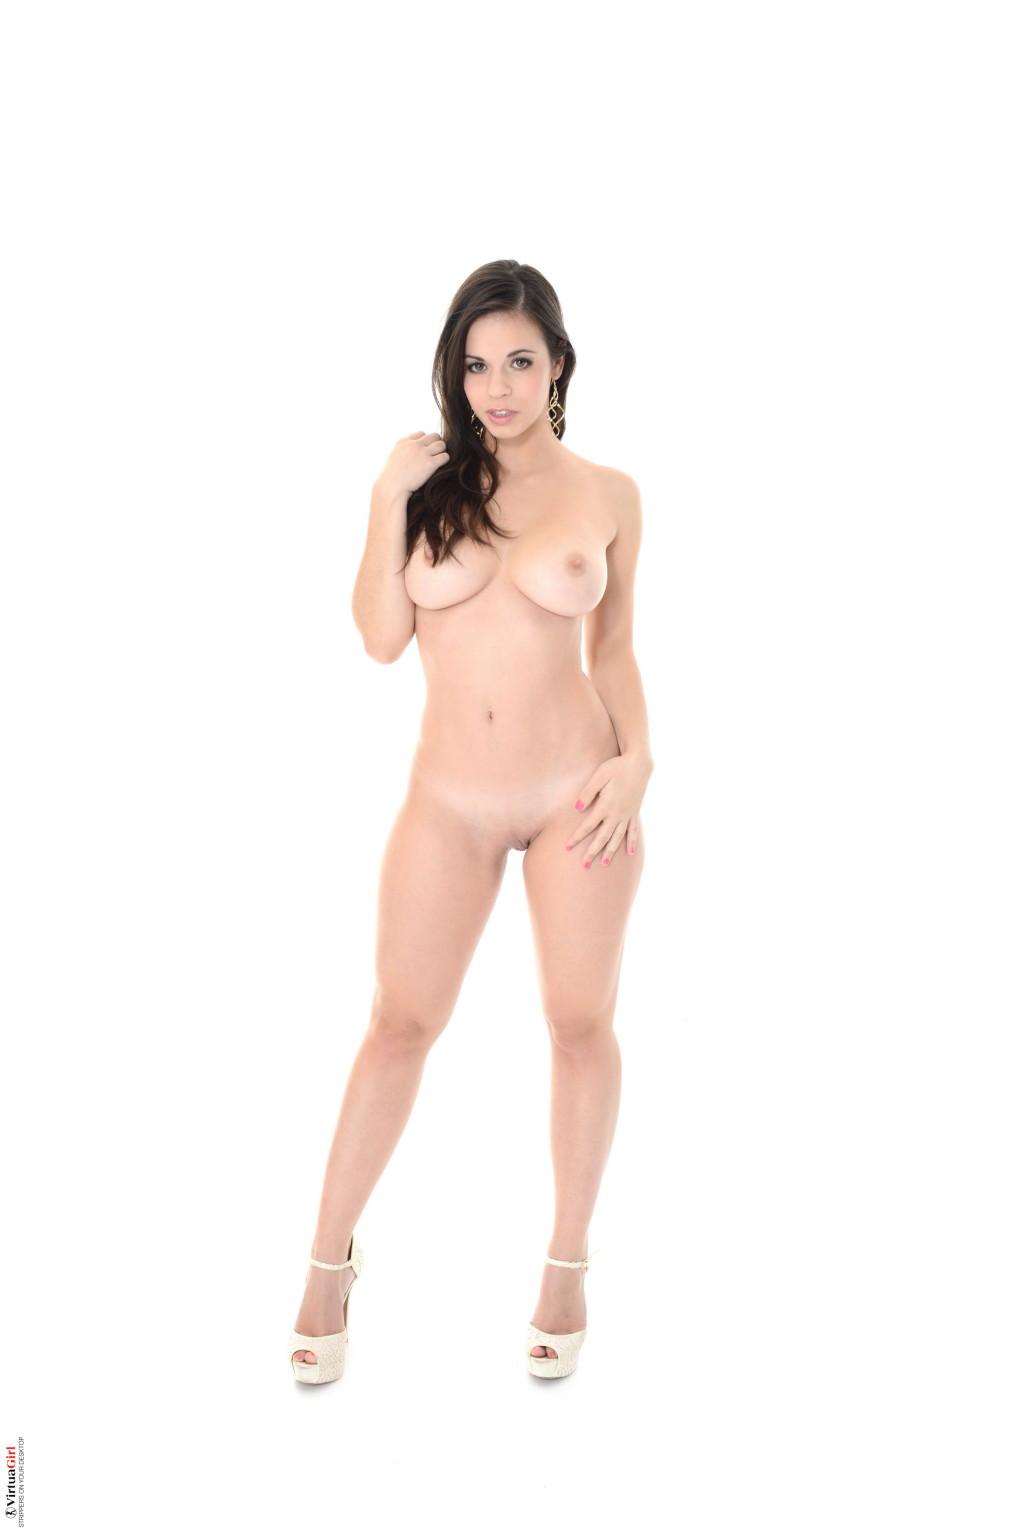 free naturist photos